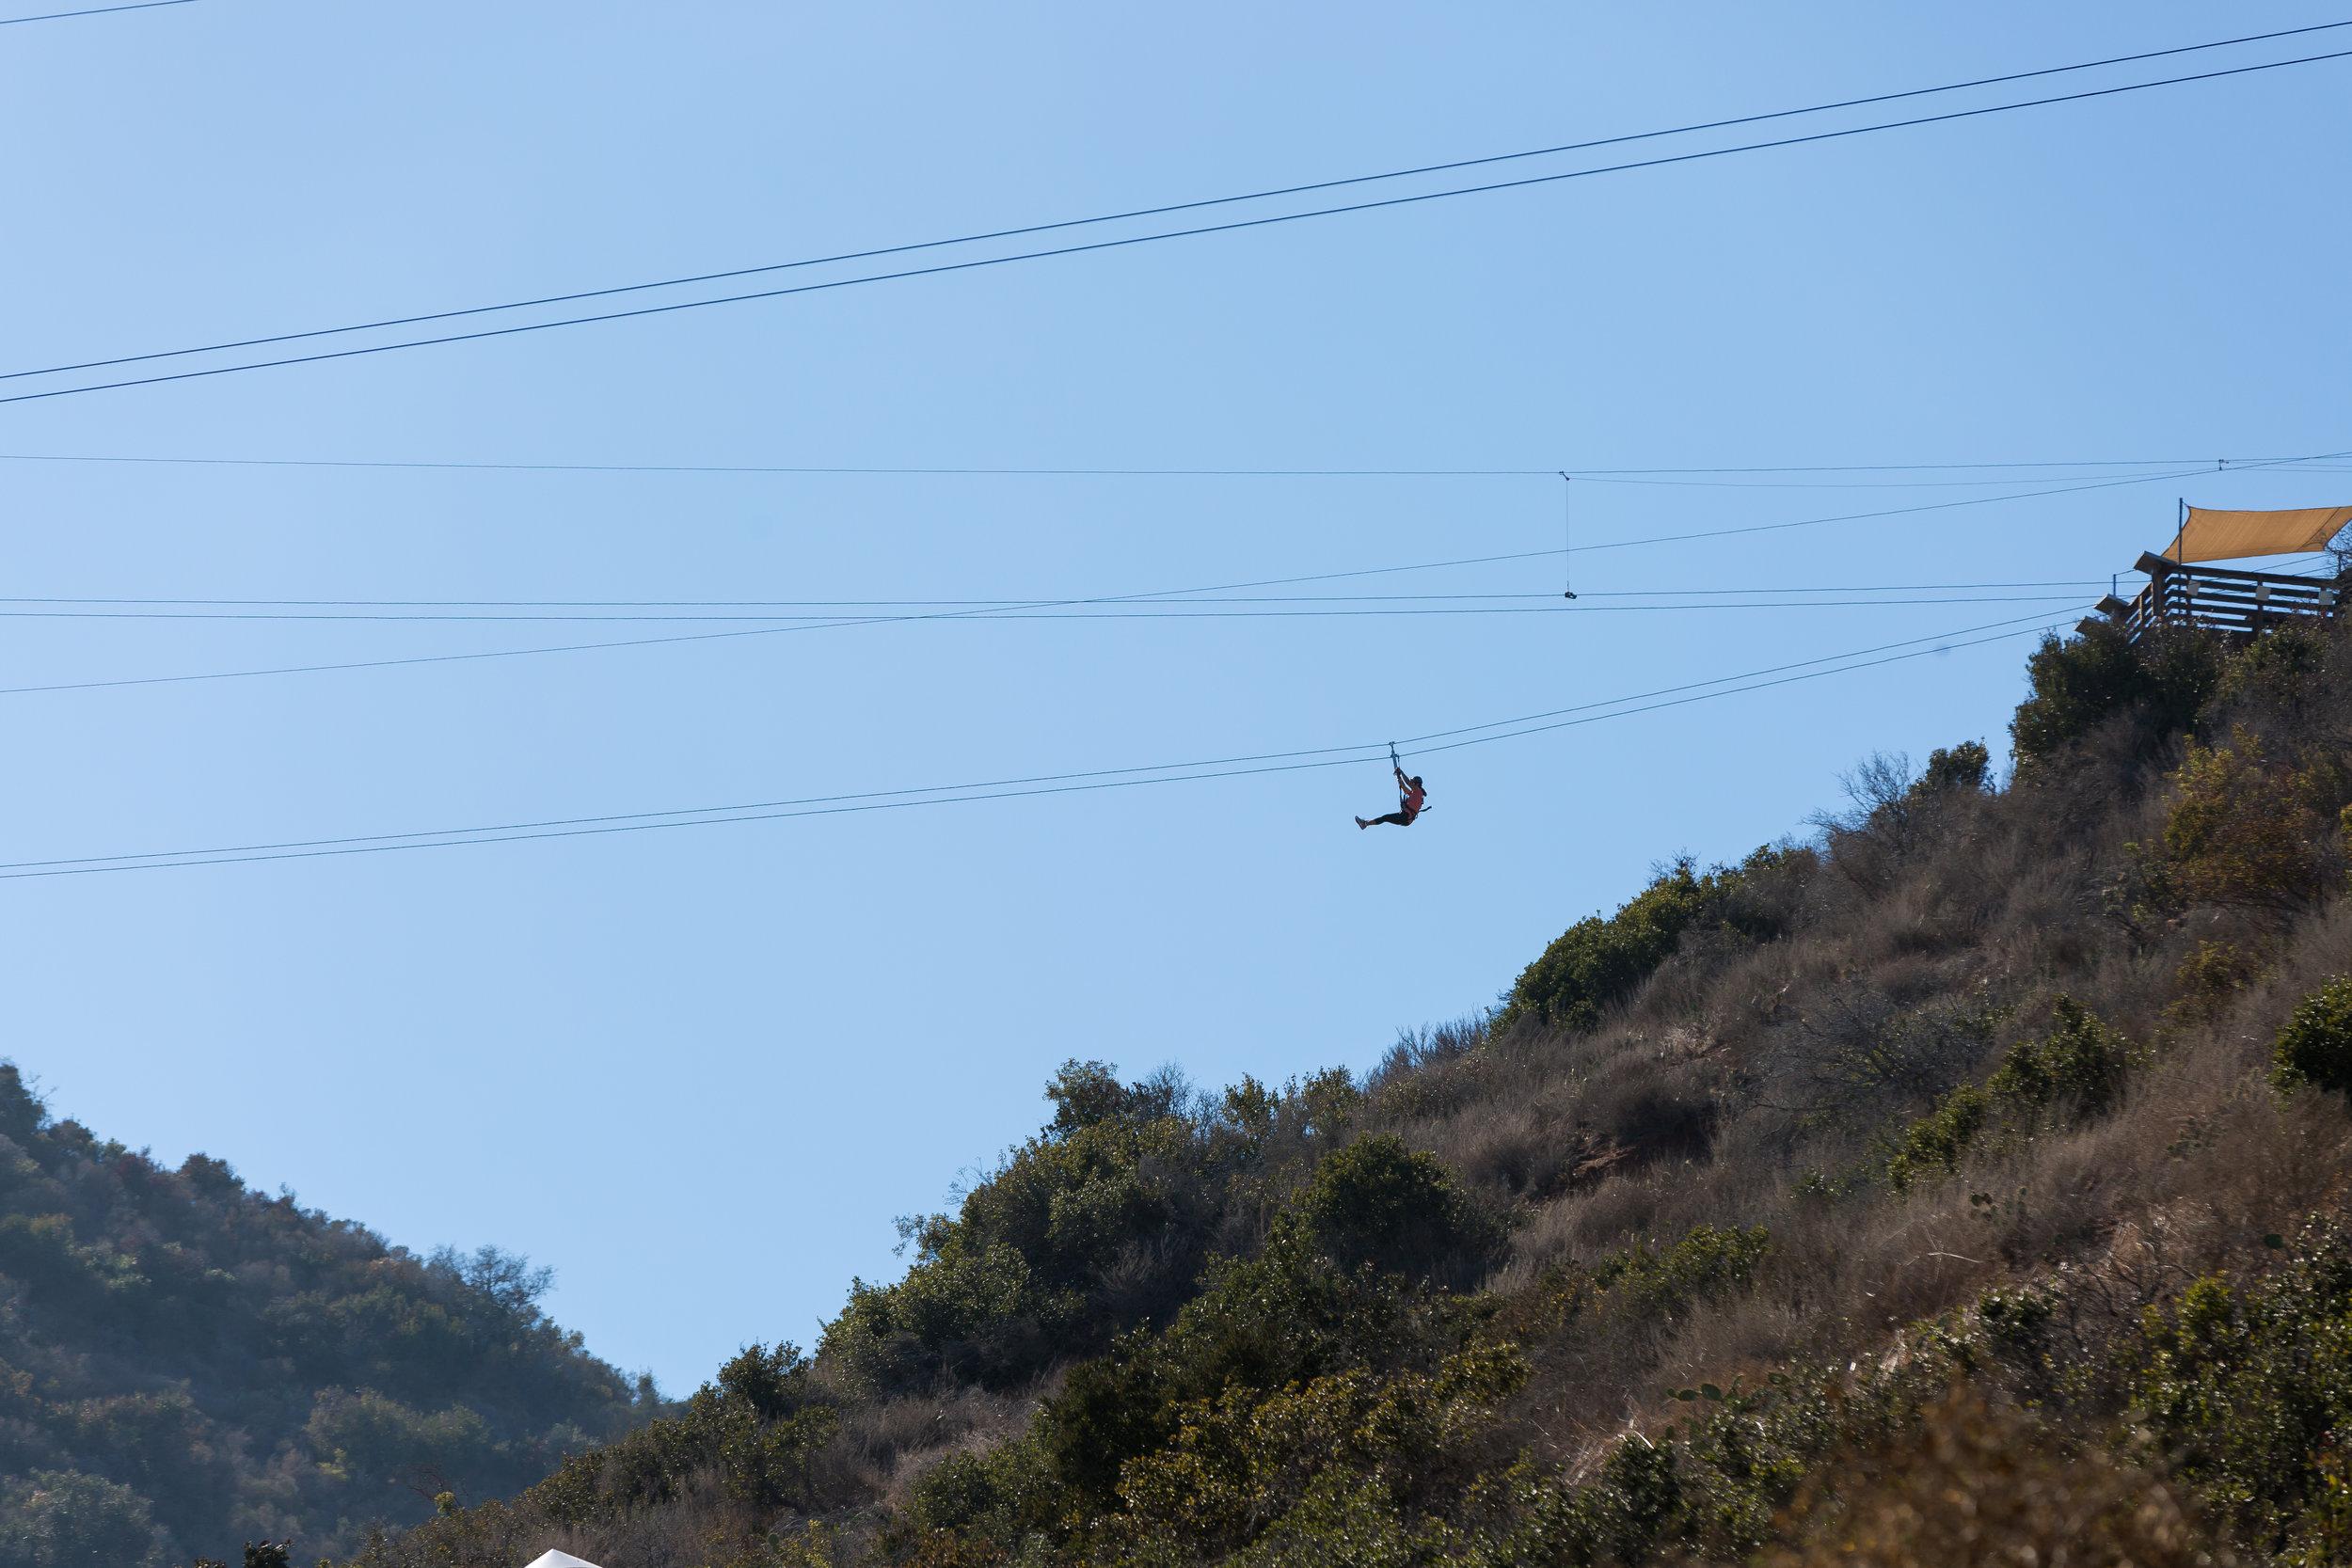 ABE1_Catalina_Zip_Line_Aerial_Adventure-86.jpg